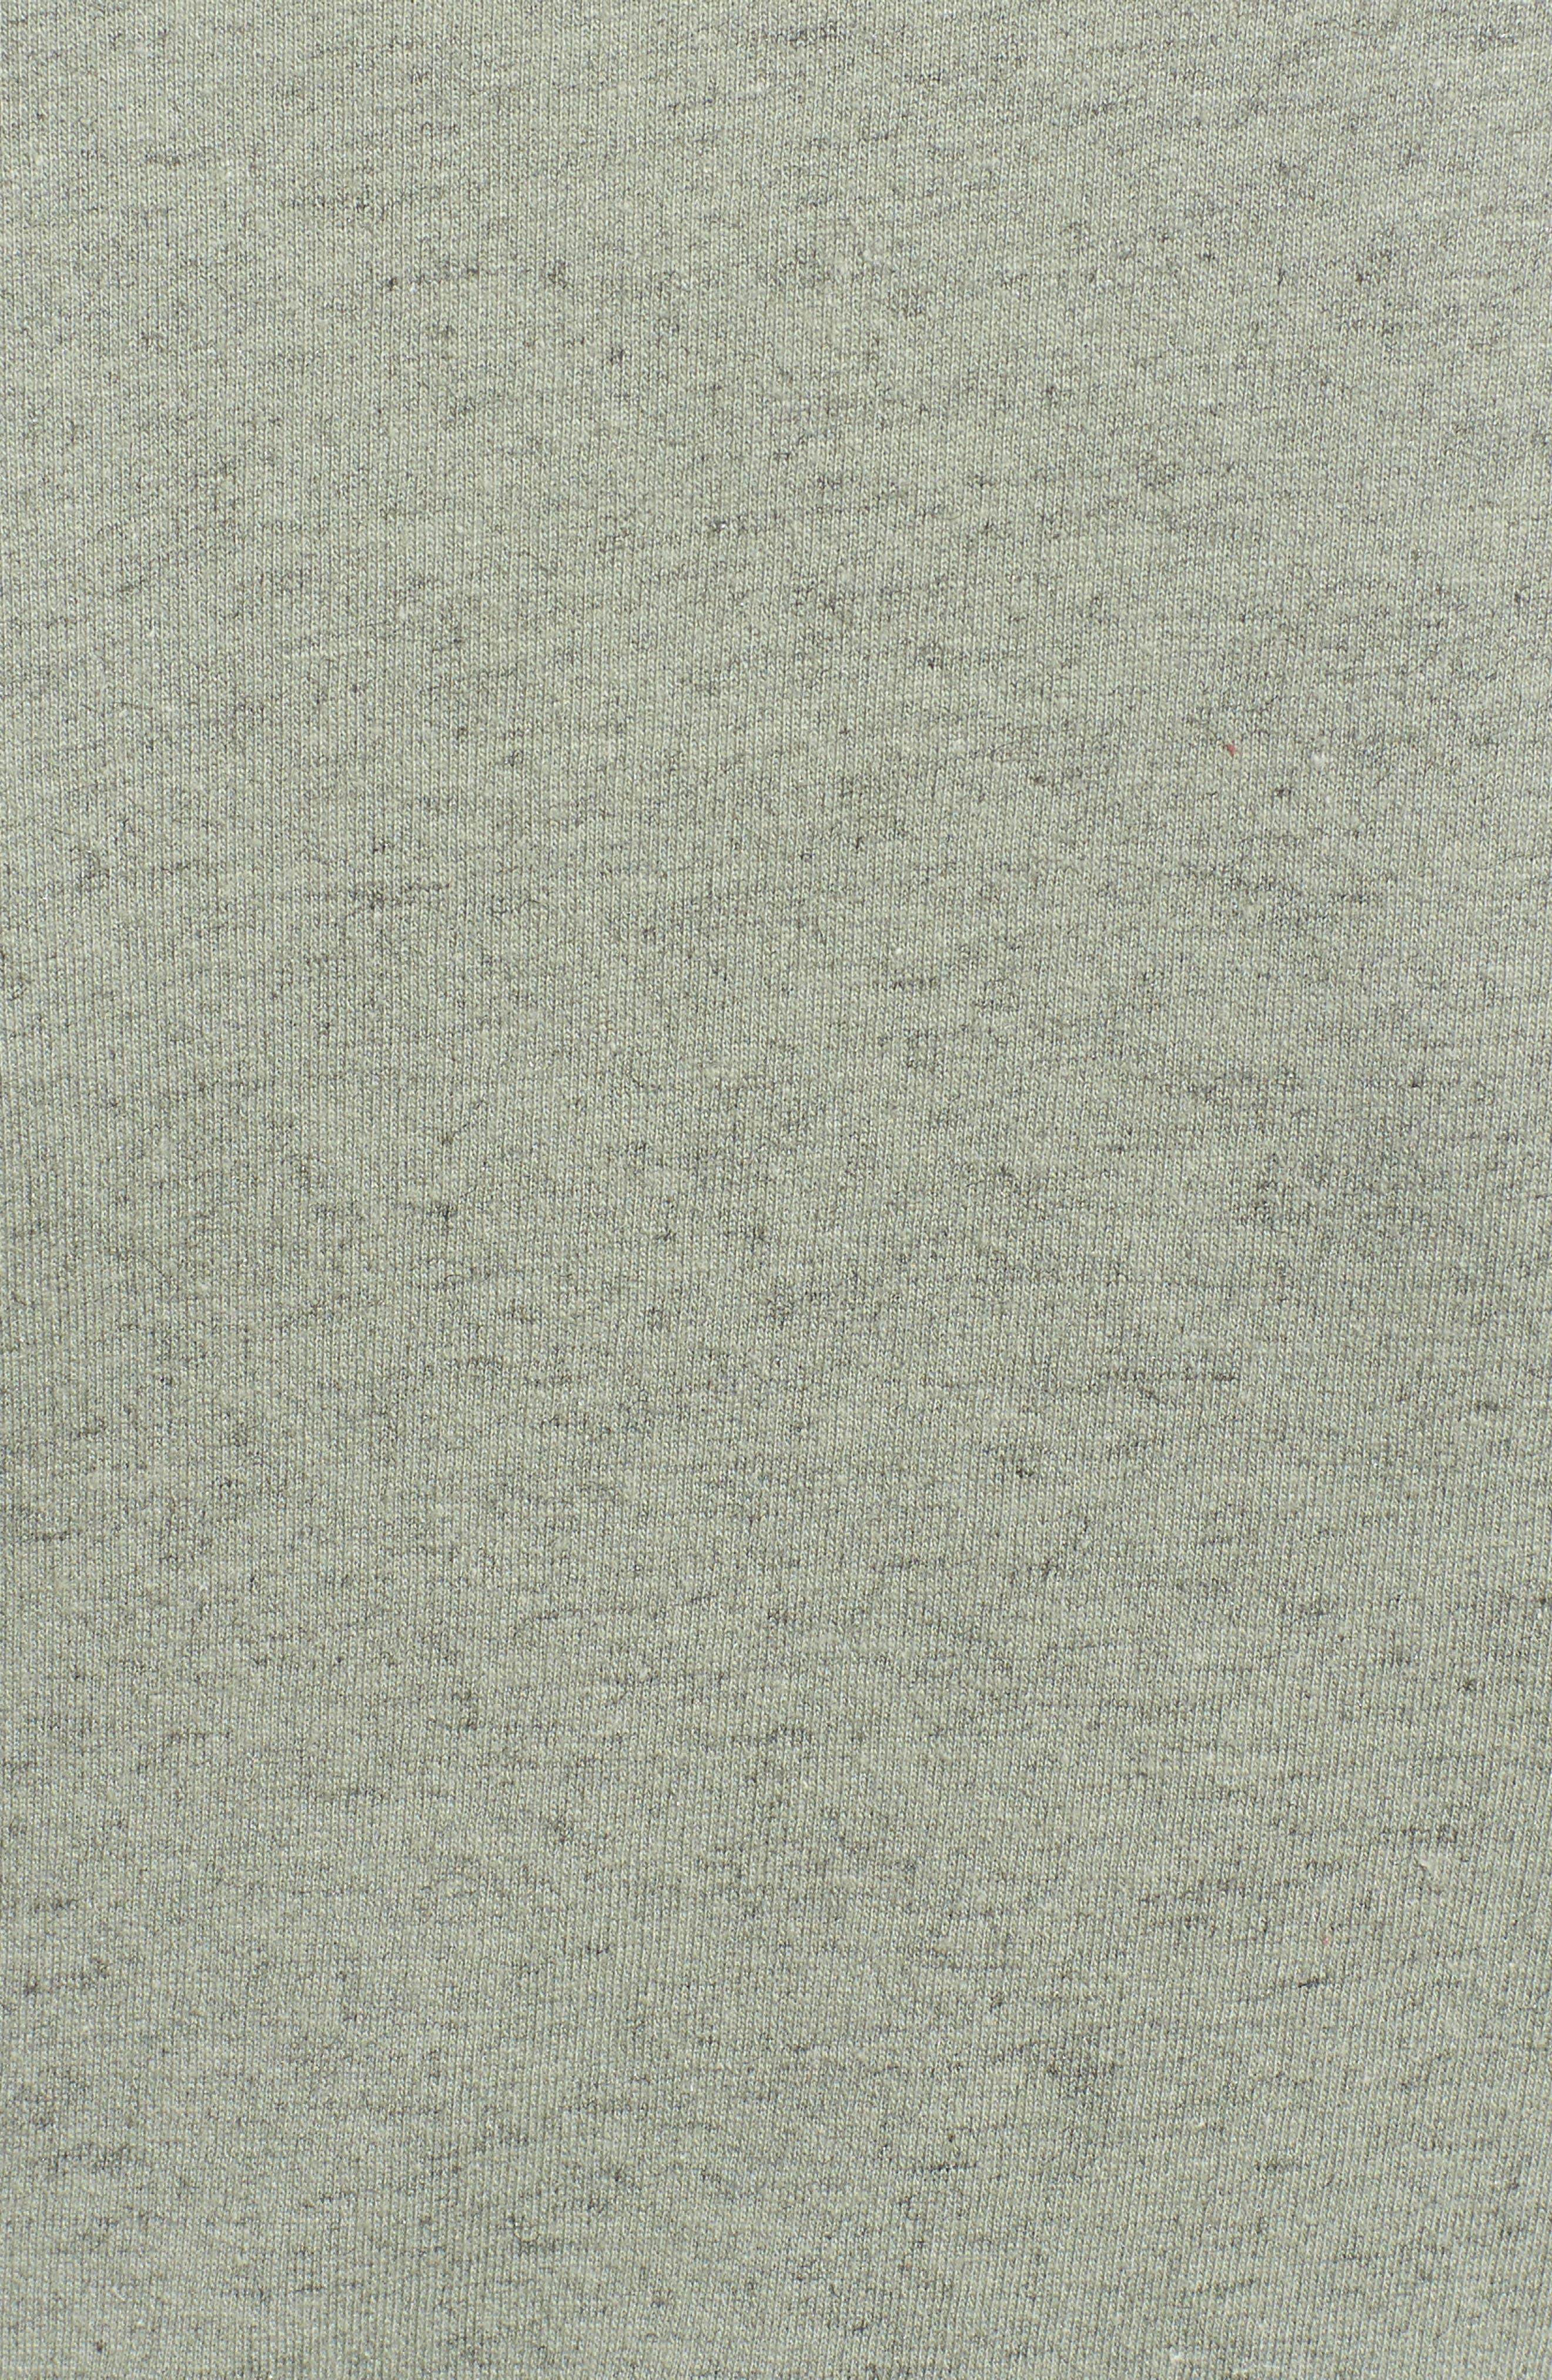 Stella Knit Jacket,                             Alternate thumbnail 59, color,